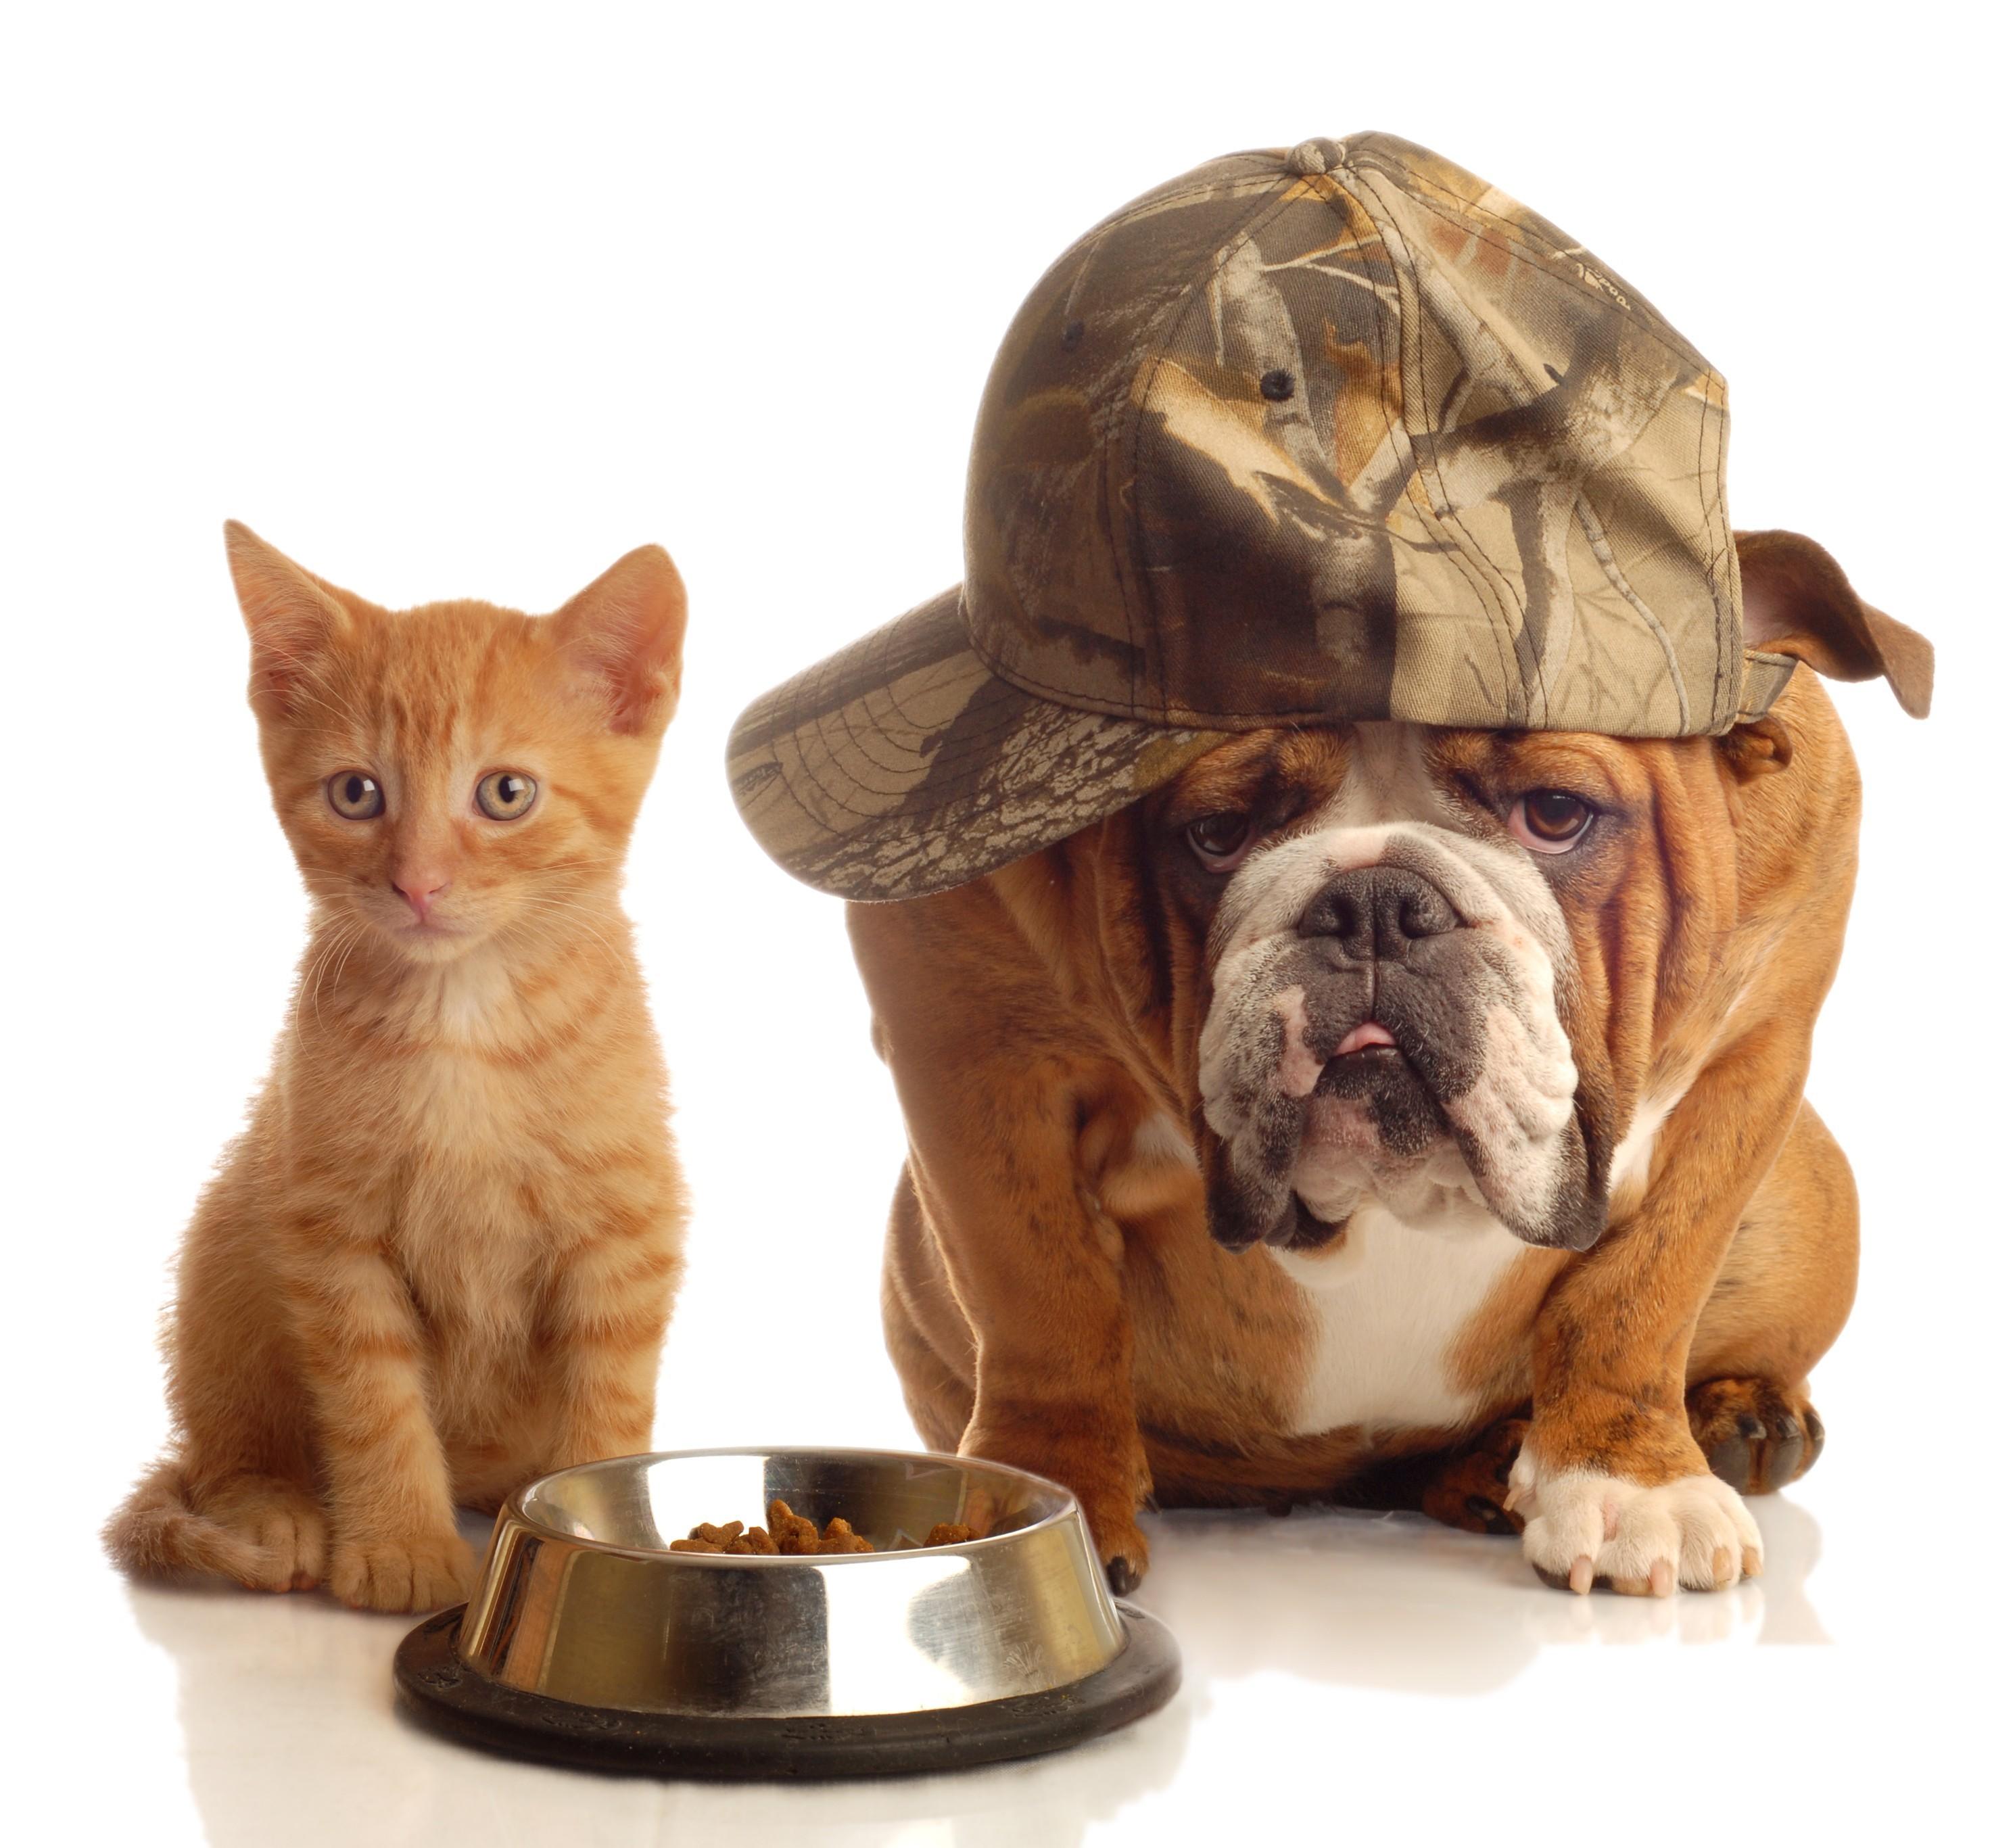 animal farm kgb vs dogs